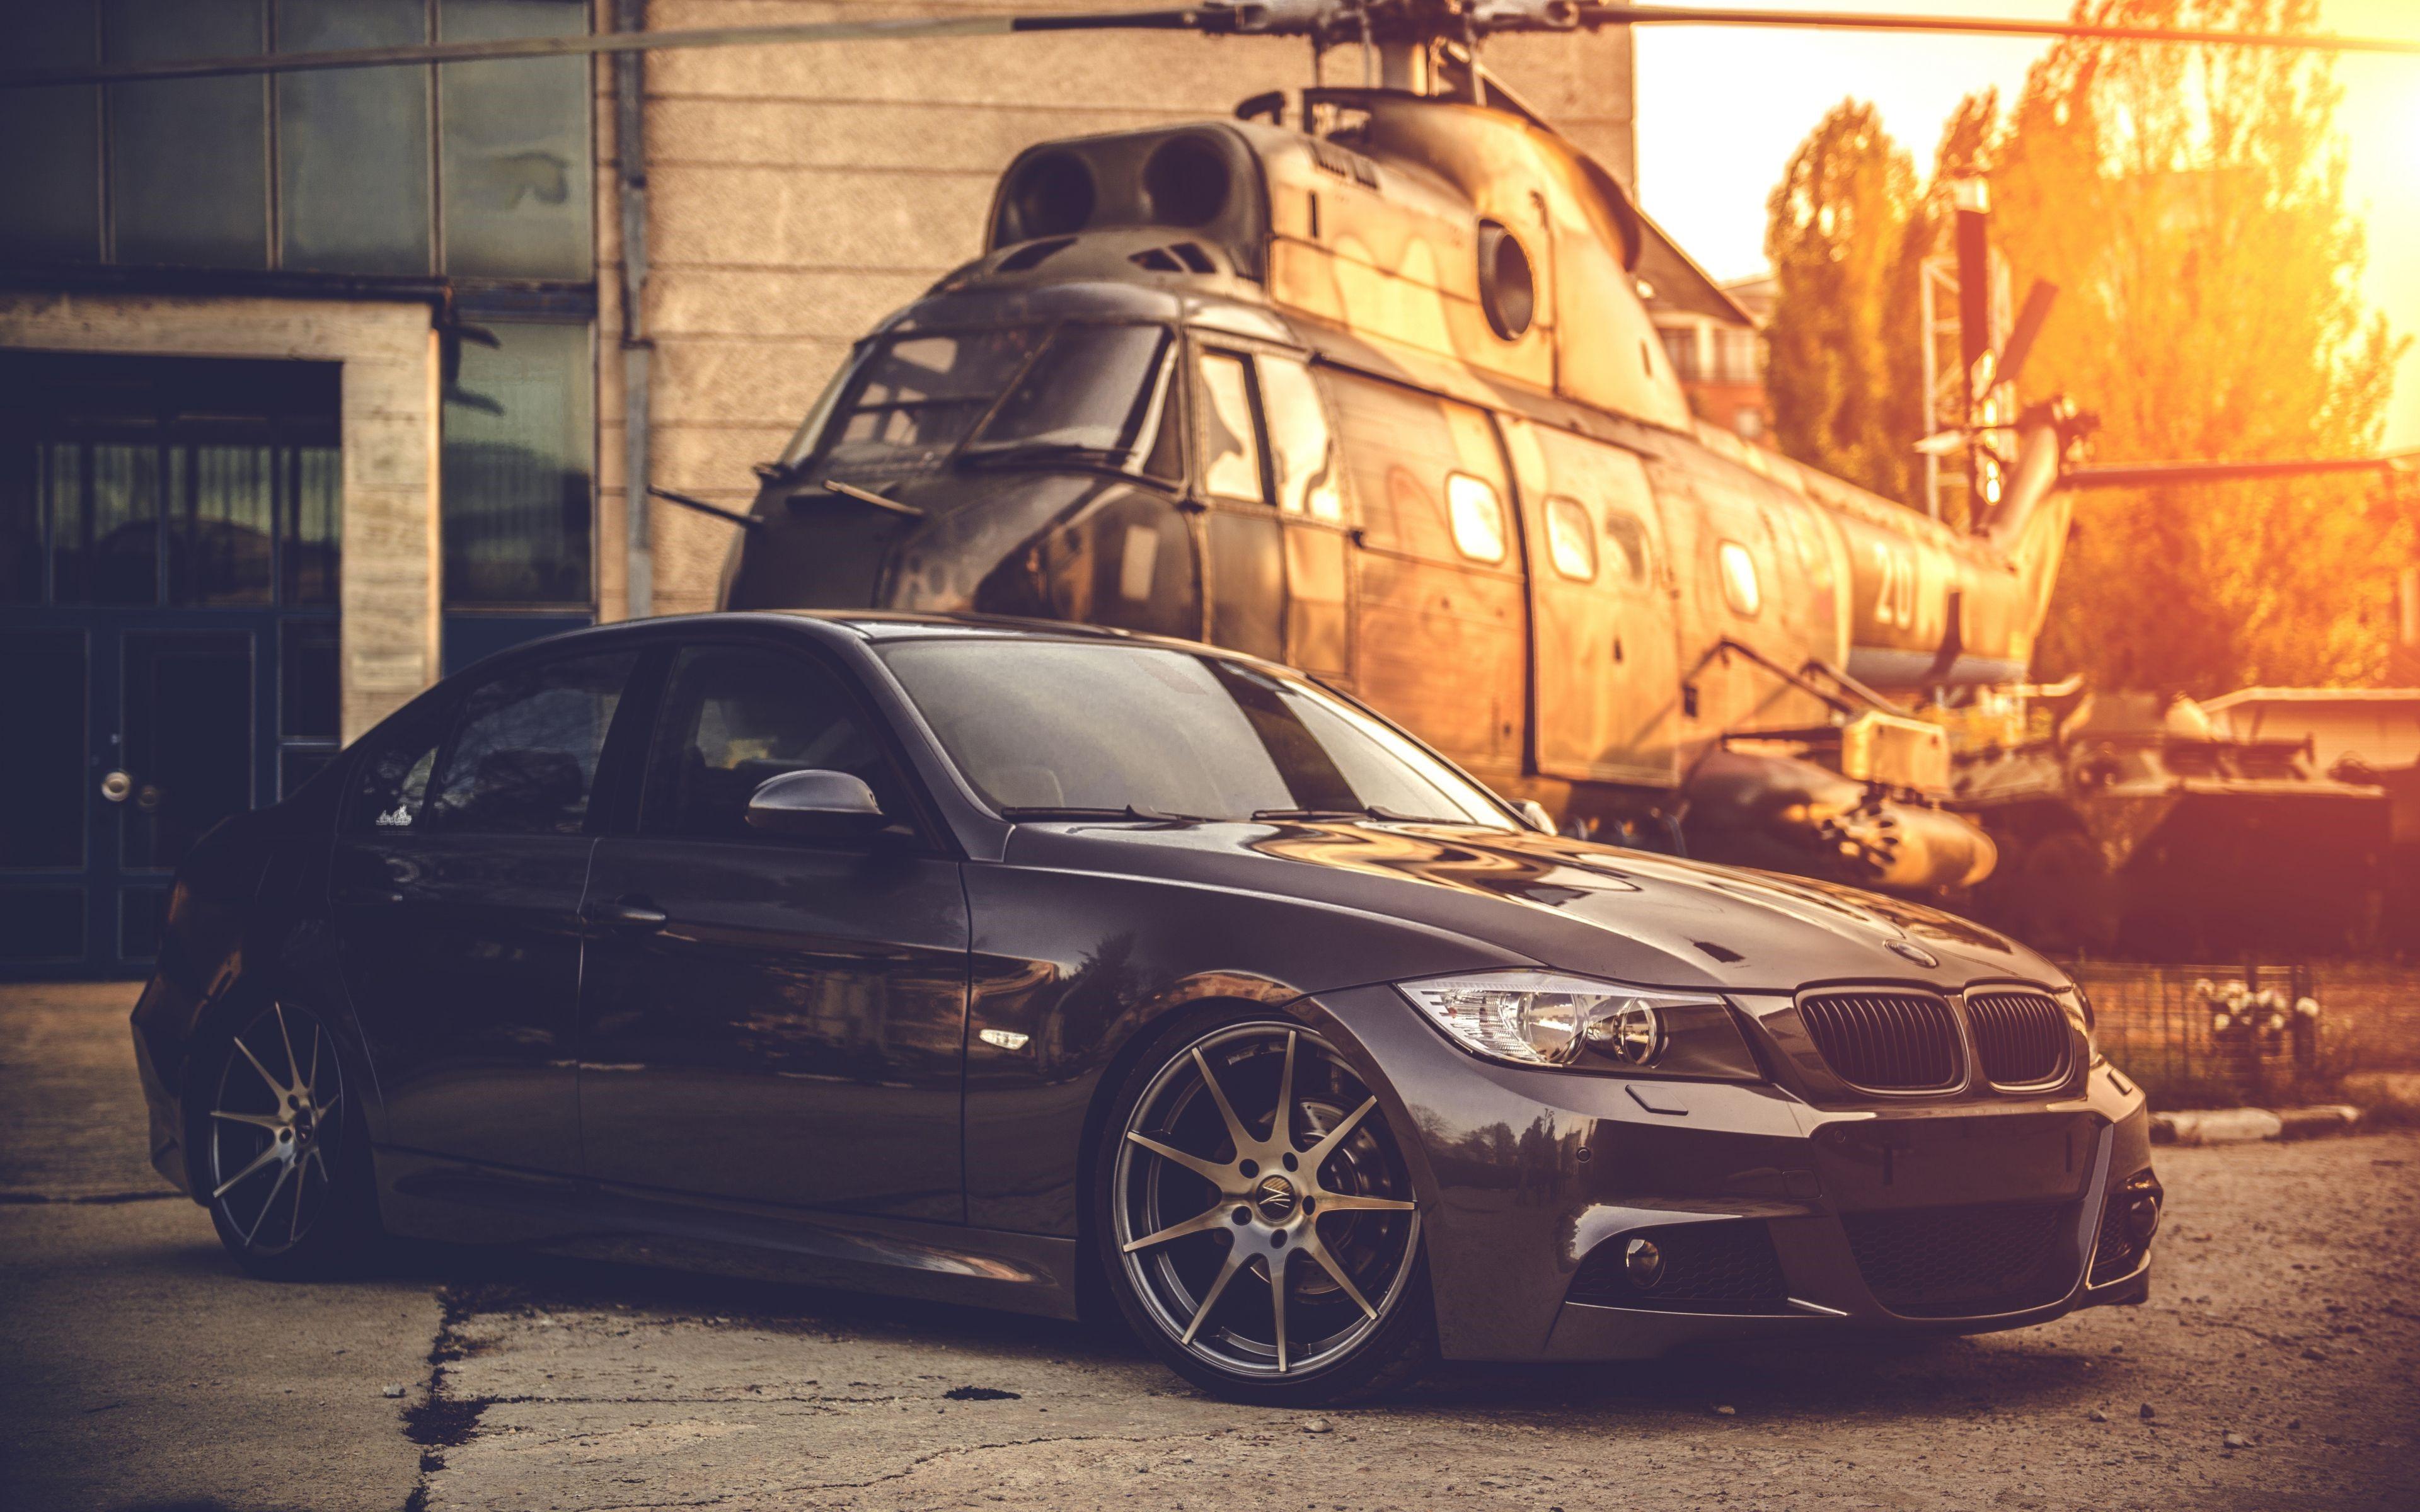 4K Car images